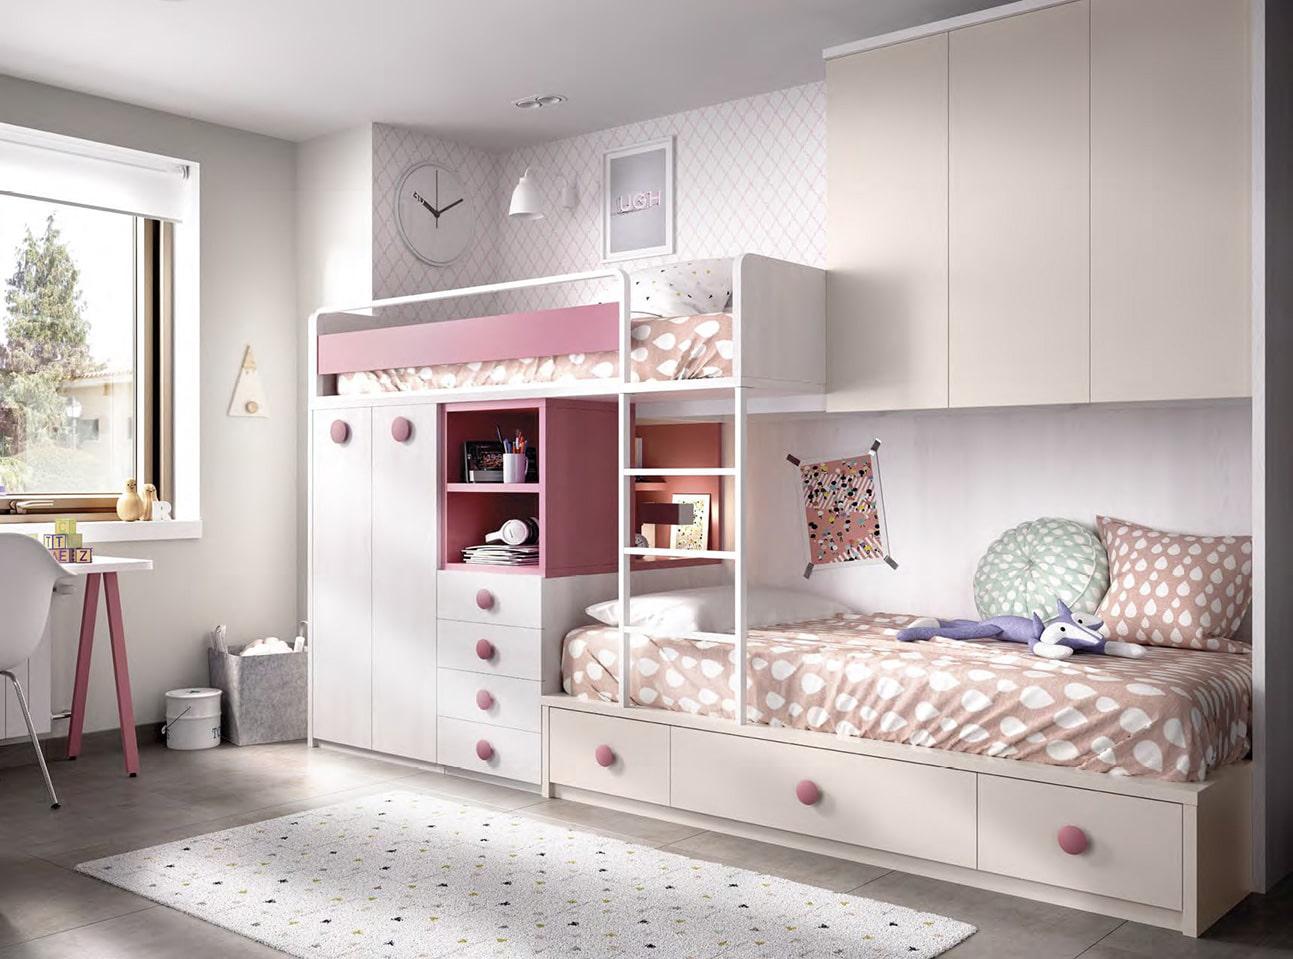 camas-block-Mundo-Joven-muebles-paco-caballero-512-5caf6818b63b1